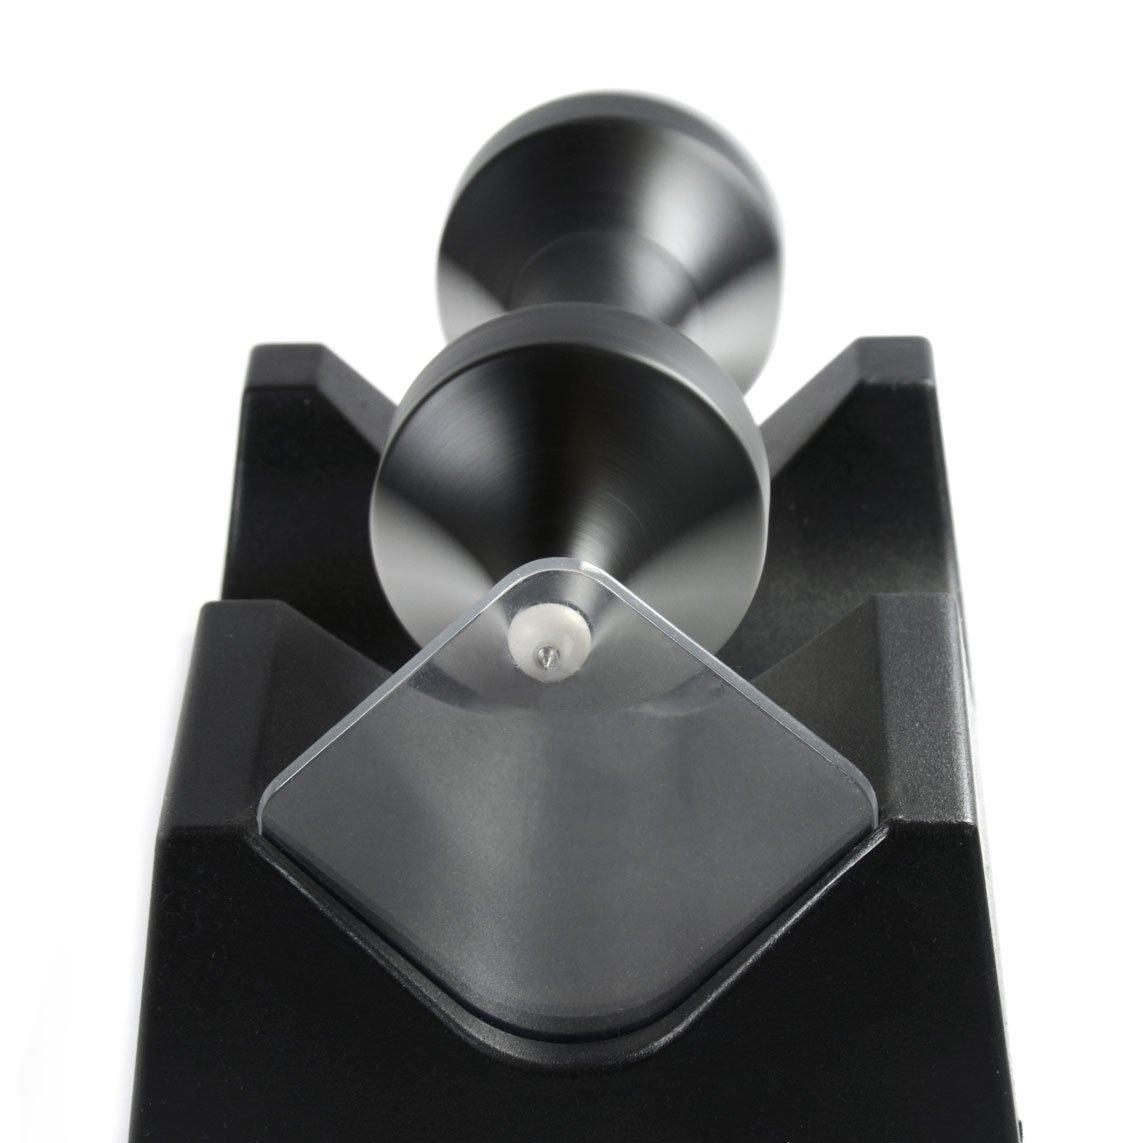 CMS MAGNETICS Magnetic Levitating Desk Toy - Levitation Magnet Demonstrator (2 Pieces) by CMS MAGNETICS (Image #6)